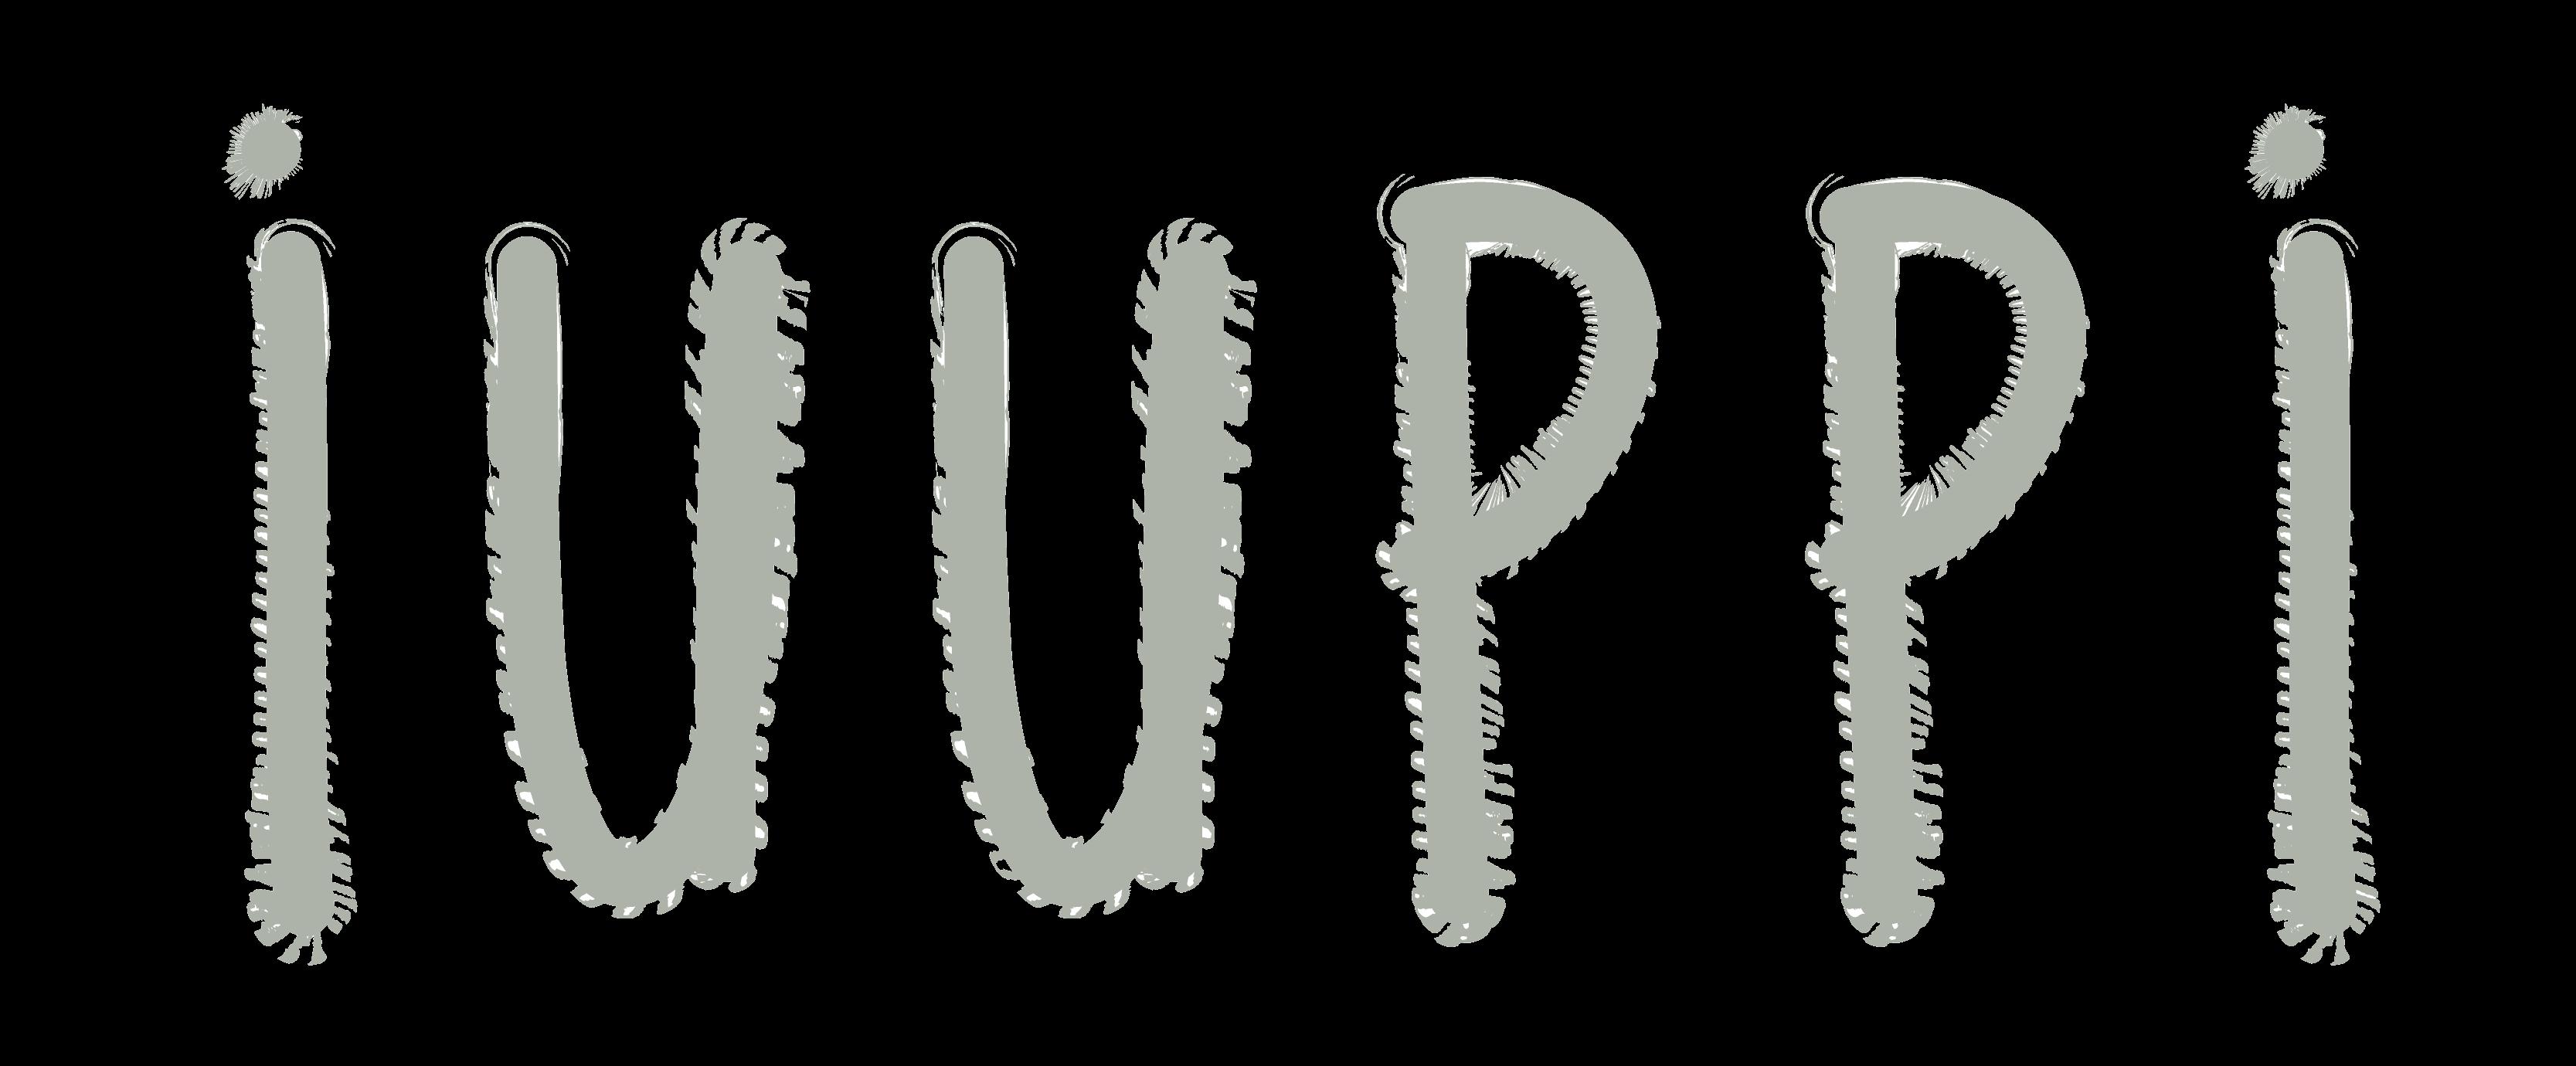 Iuuppi Logotipo